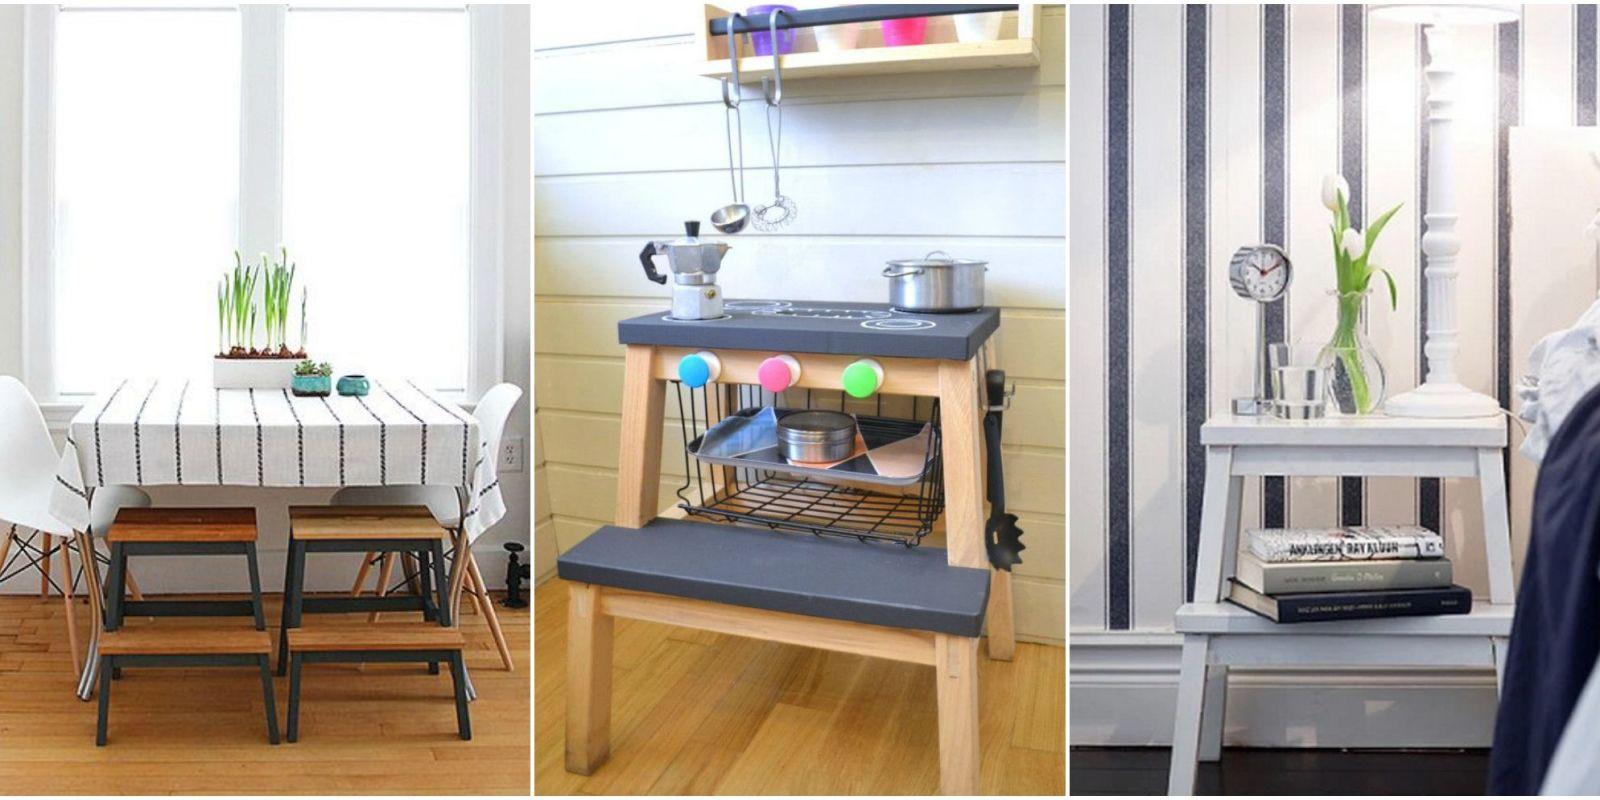 Http Www Housebeautiful Com Home Remodeling Diy Projects G2747 Ikea Bekvam Stepstool Hacks